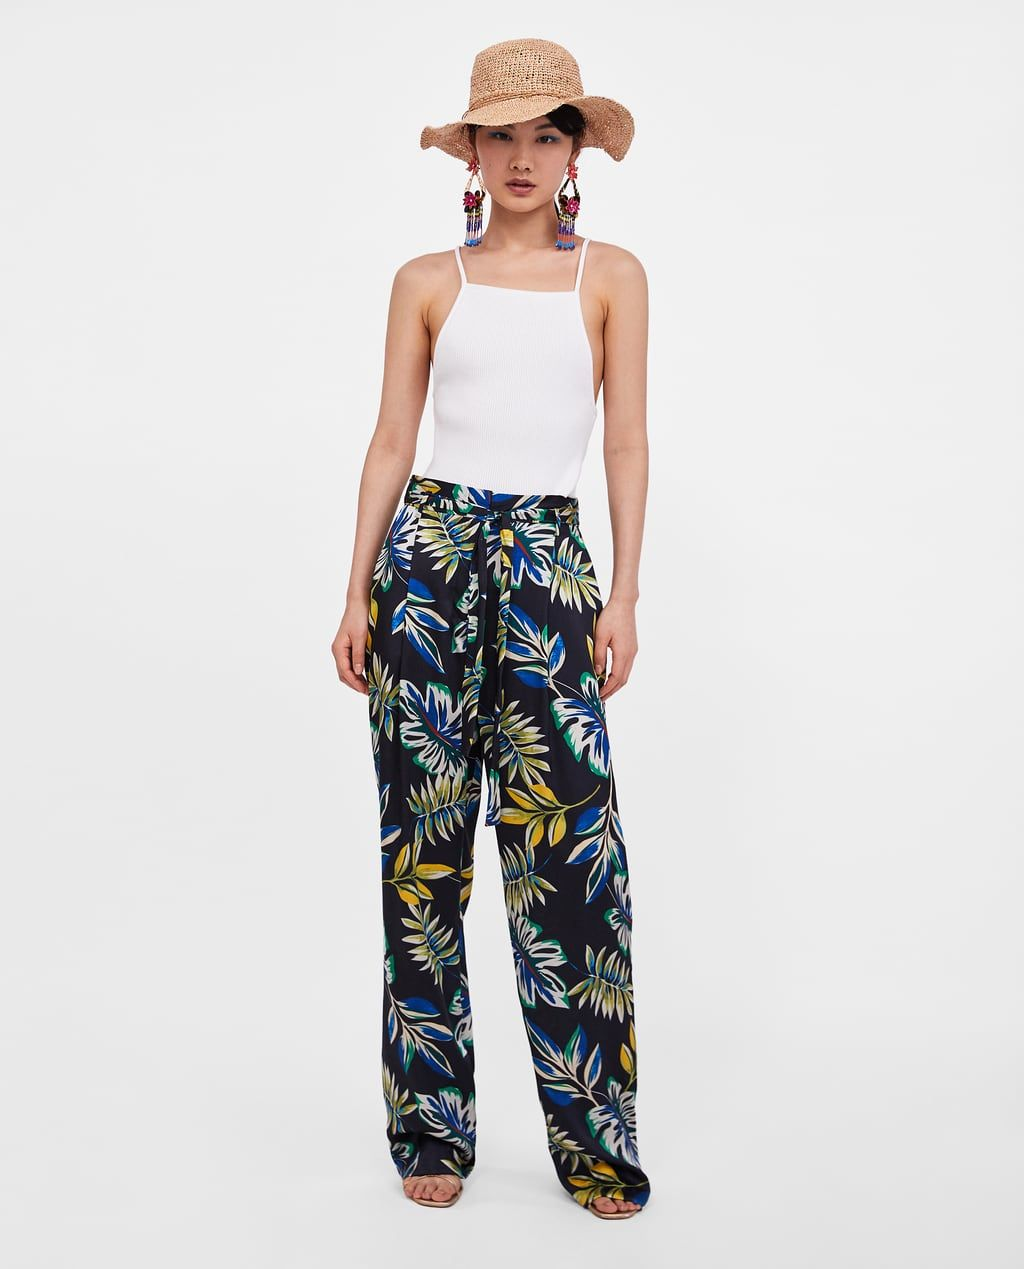 Pantalon Ancho Estampado Floral Ropa Ropa Hippie Look Playero